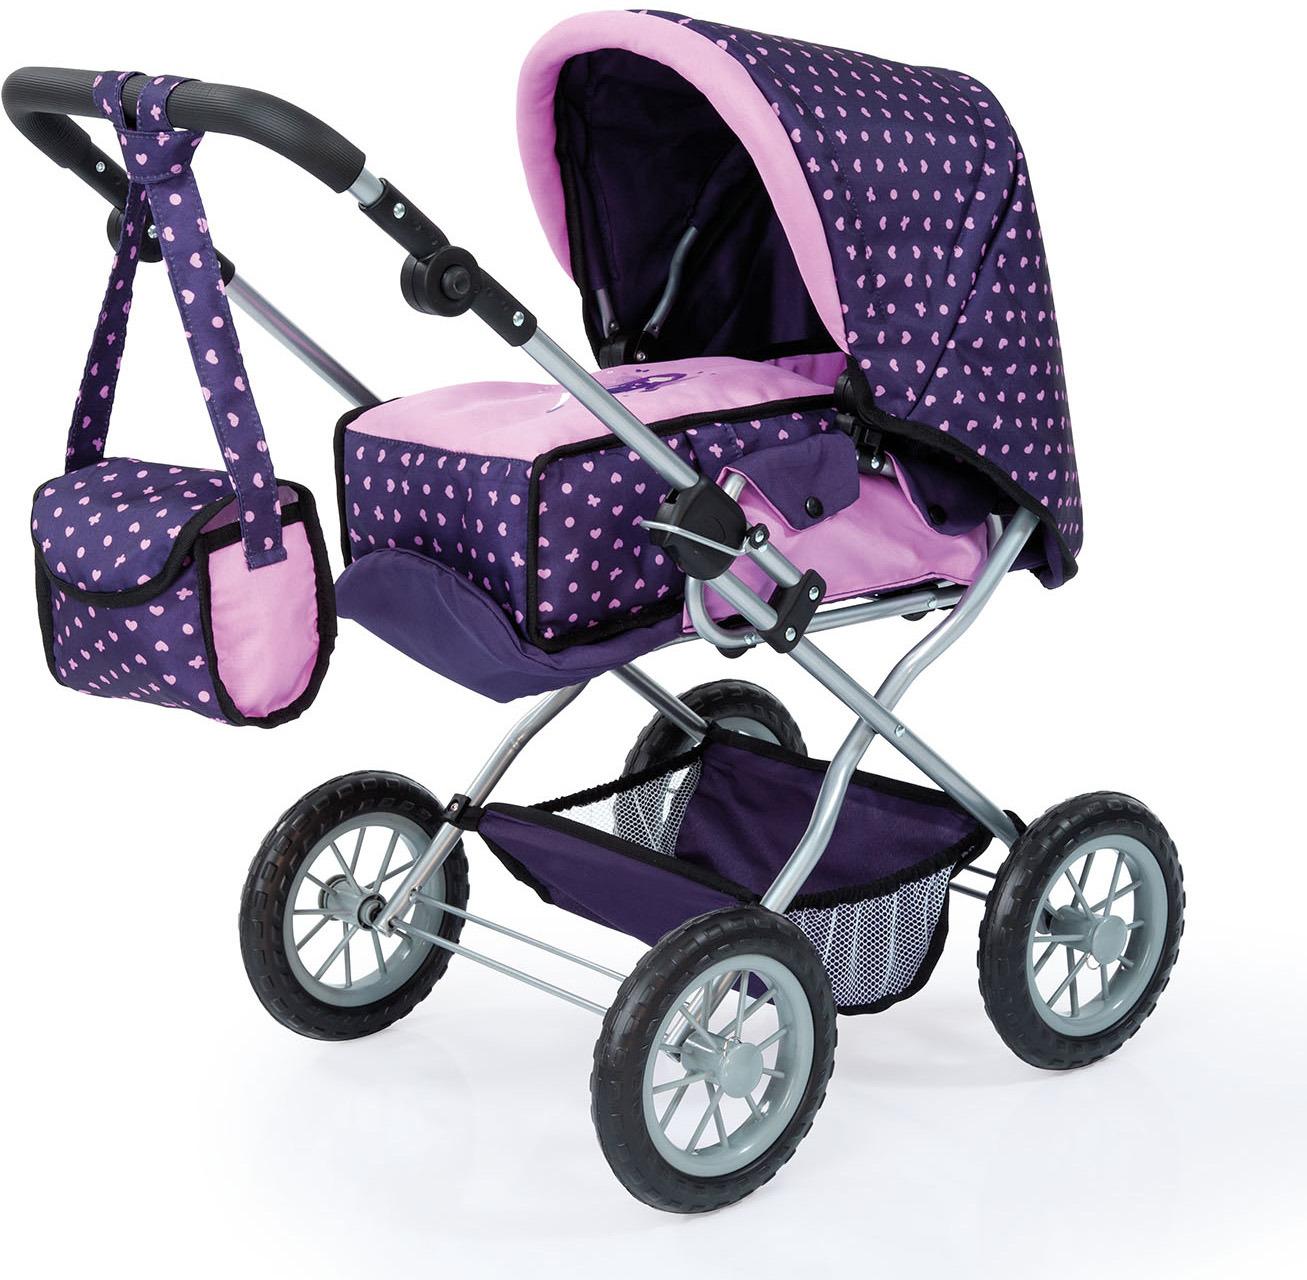 Bayer Транспорт для кукол Коляска Гранде 15075AA коляска для кукол bayer design тренди цвет серый розовый